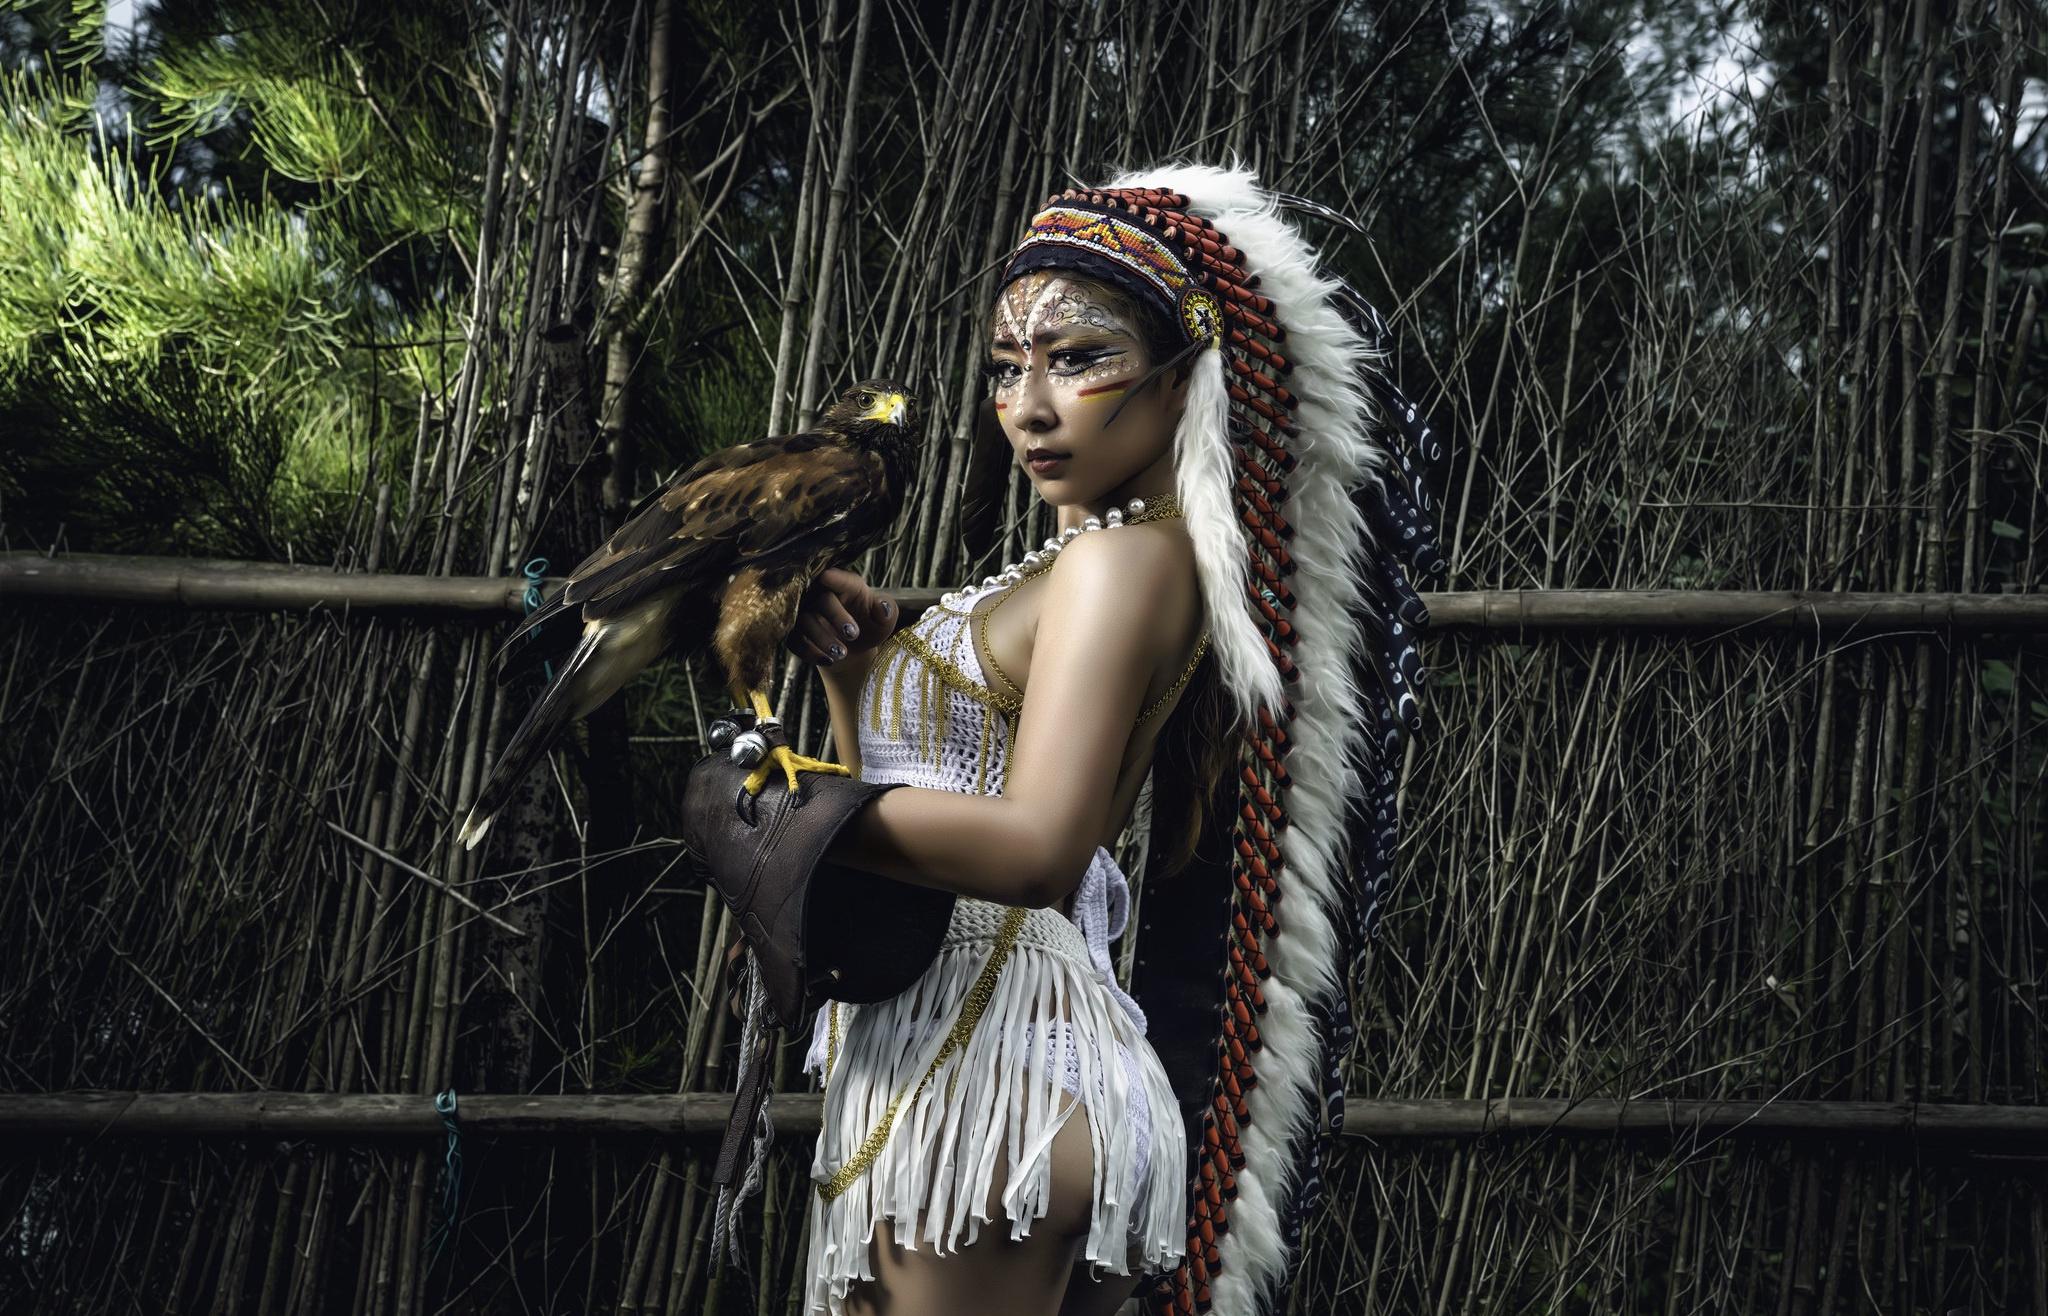 People 2048x1316 fantasy girl animals Asian birds women Native American clothing sacrilege